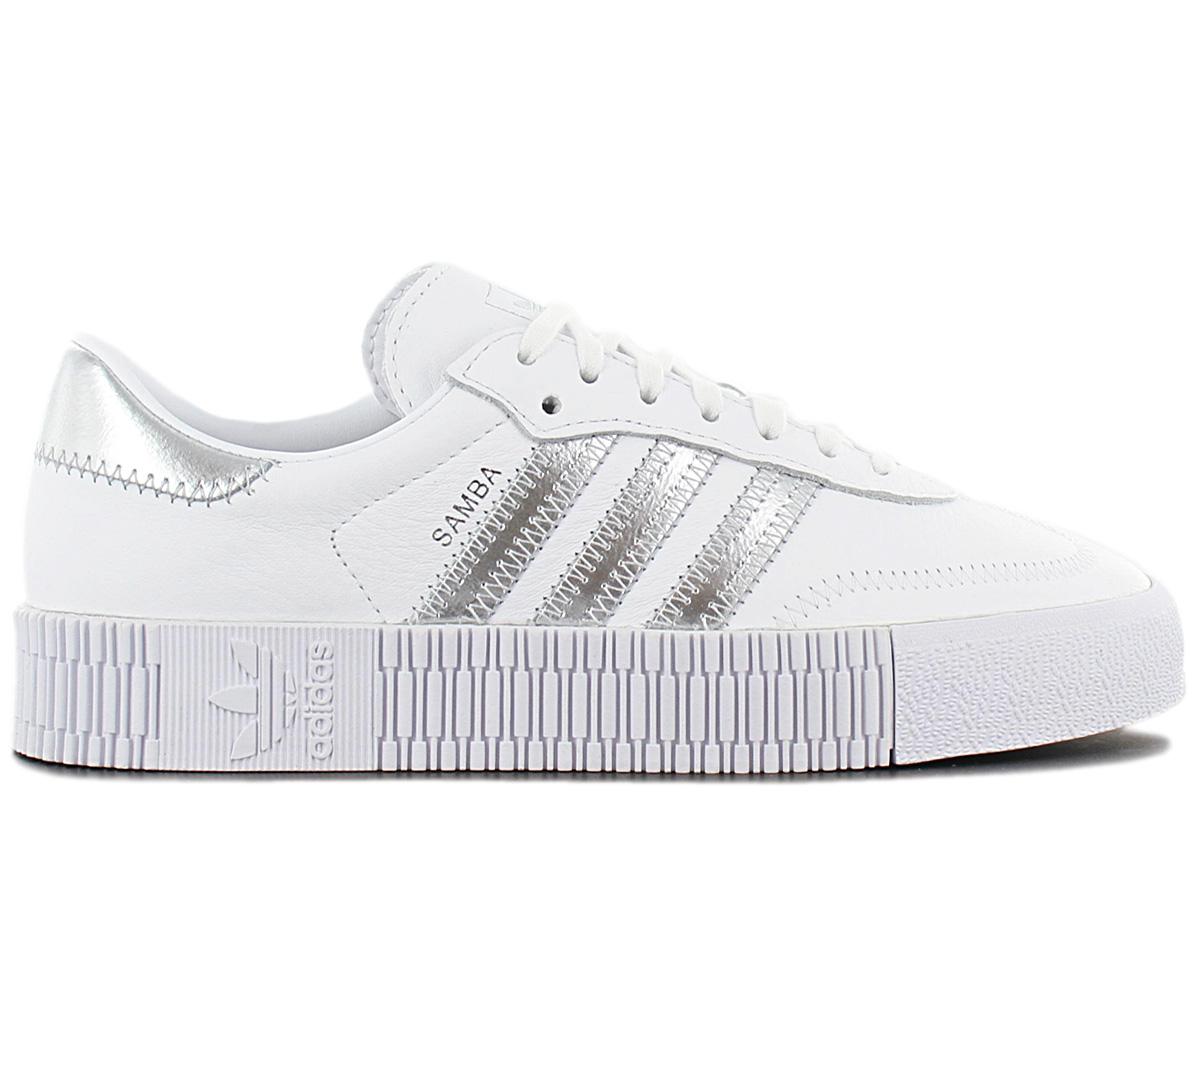 adidas Originals Sambarose Damen Sneaker weiß EU 37 1/3 - UK 4,5